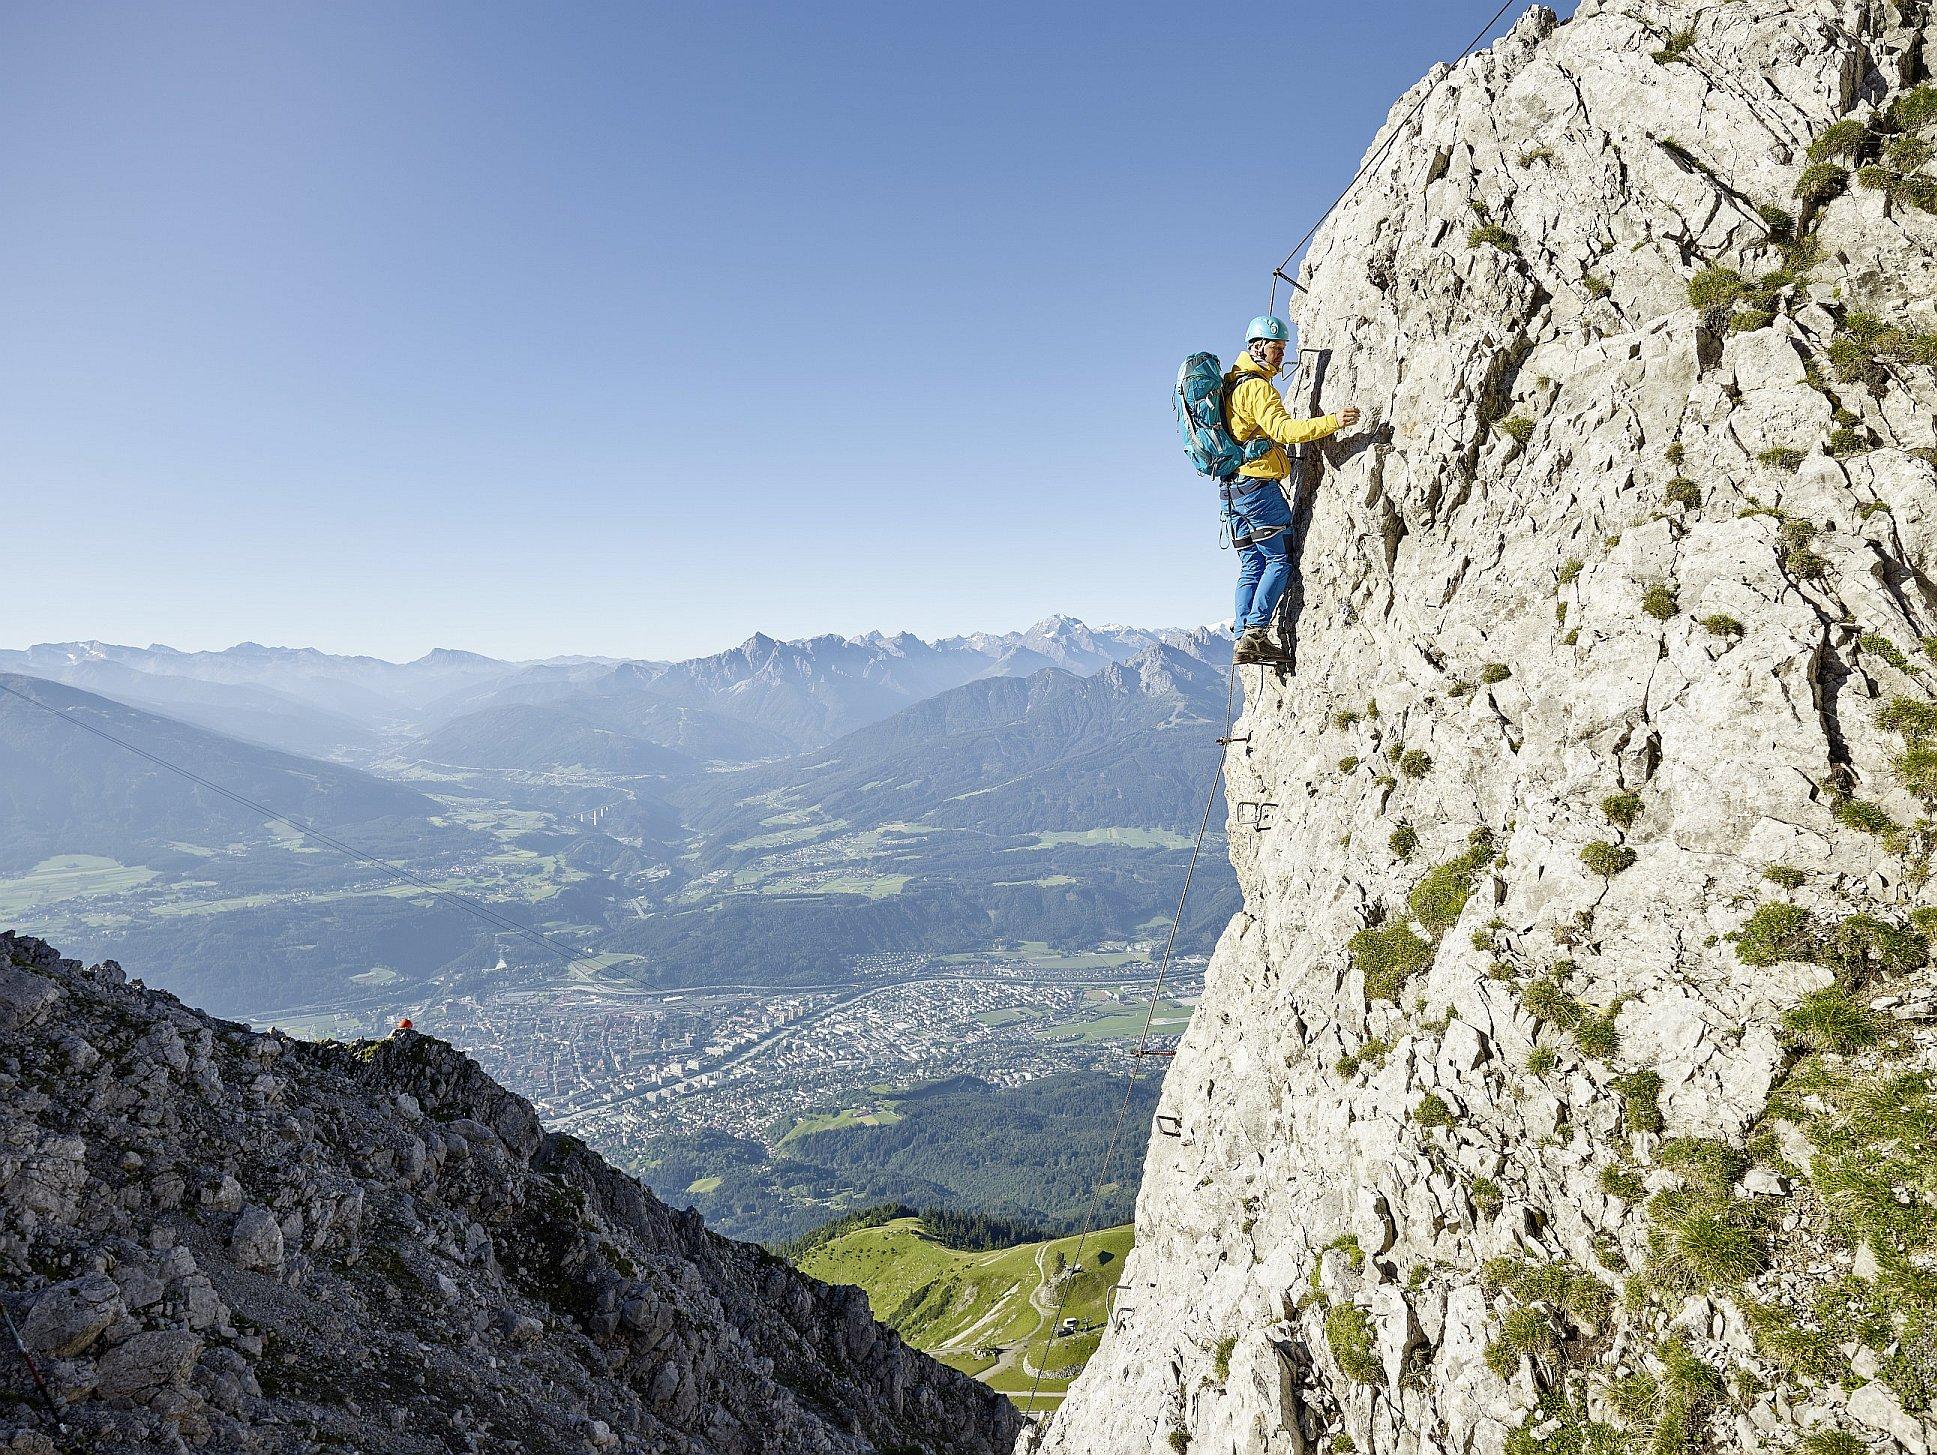 Klettersteig Innsbruck : Innsbrucker klettersteig foto: innsbruck tourismus climbers